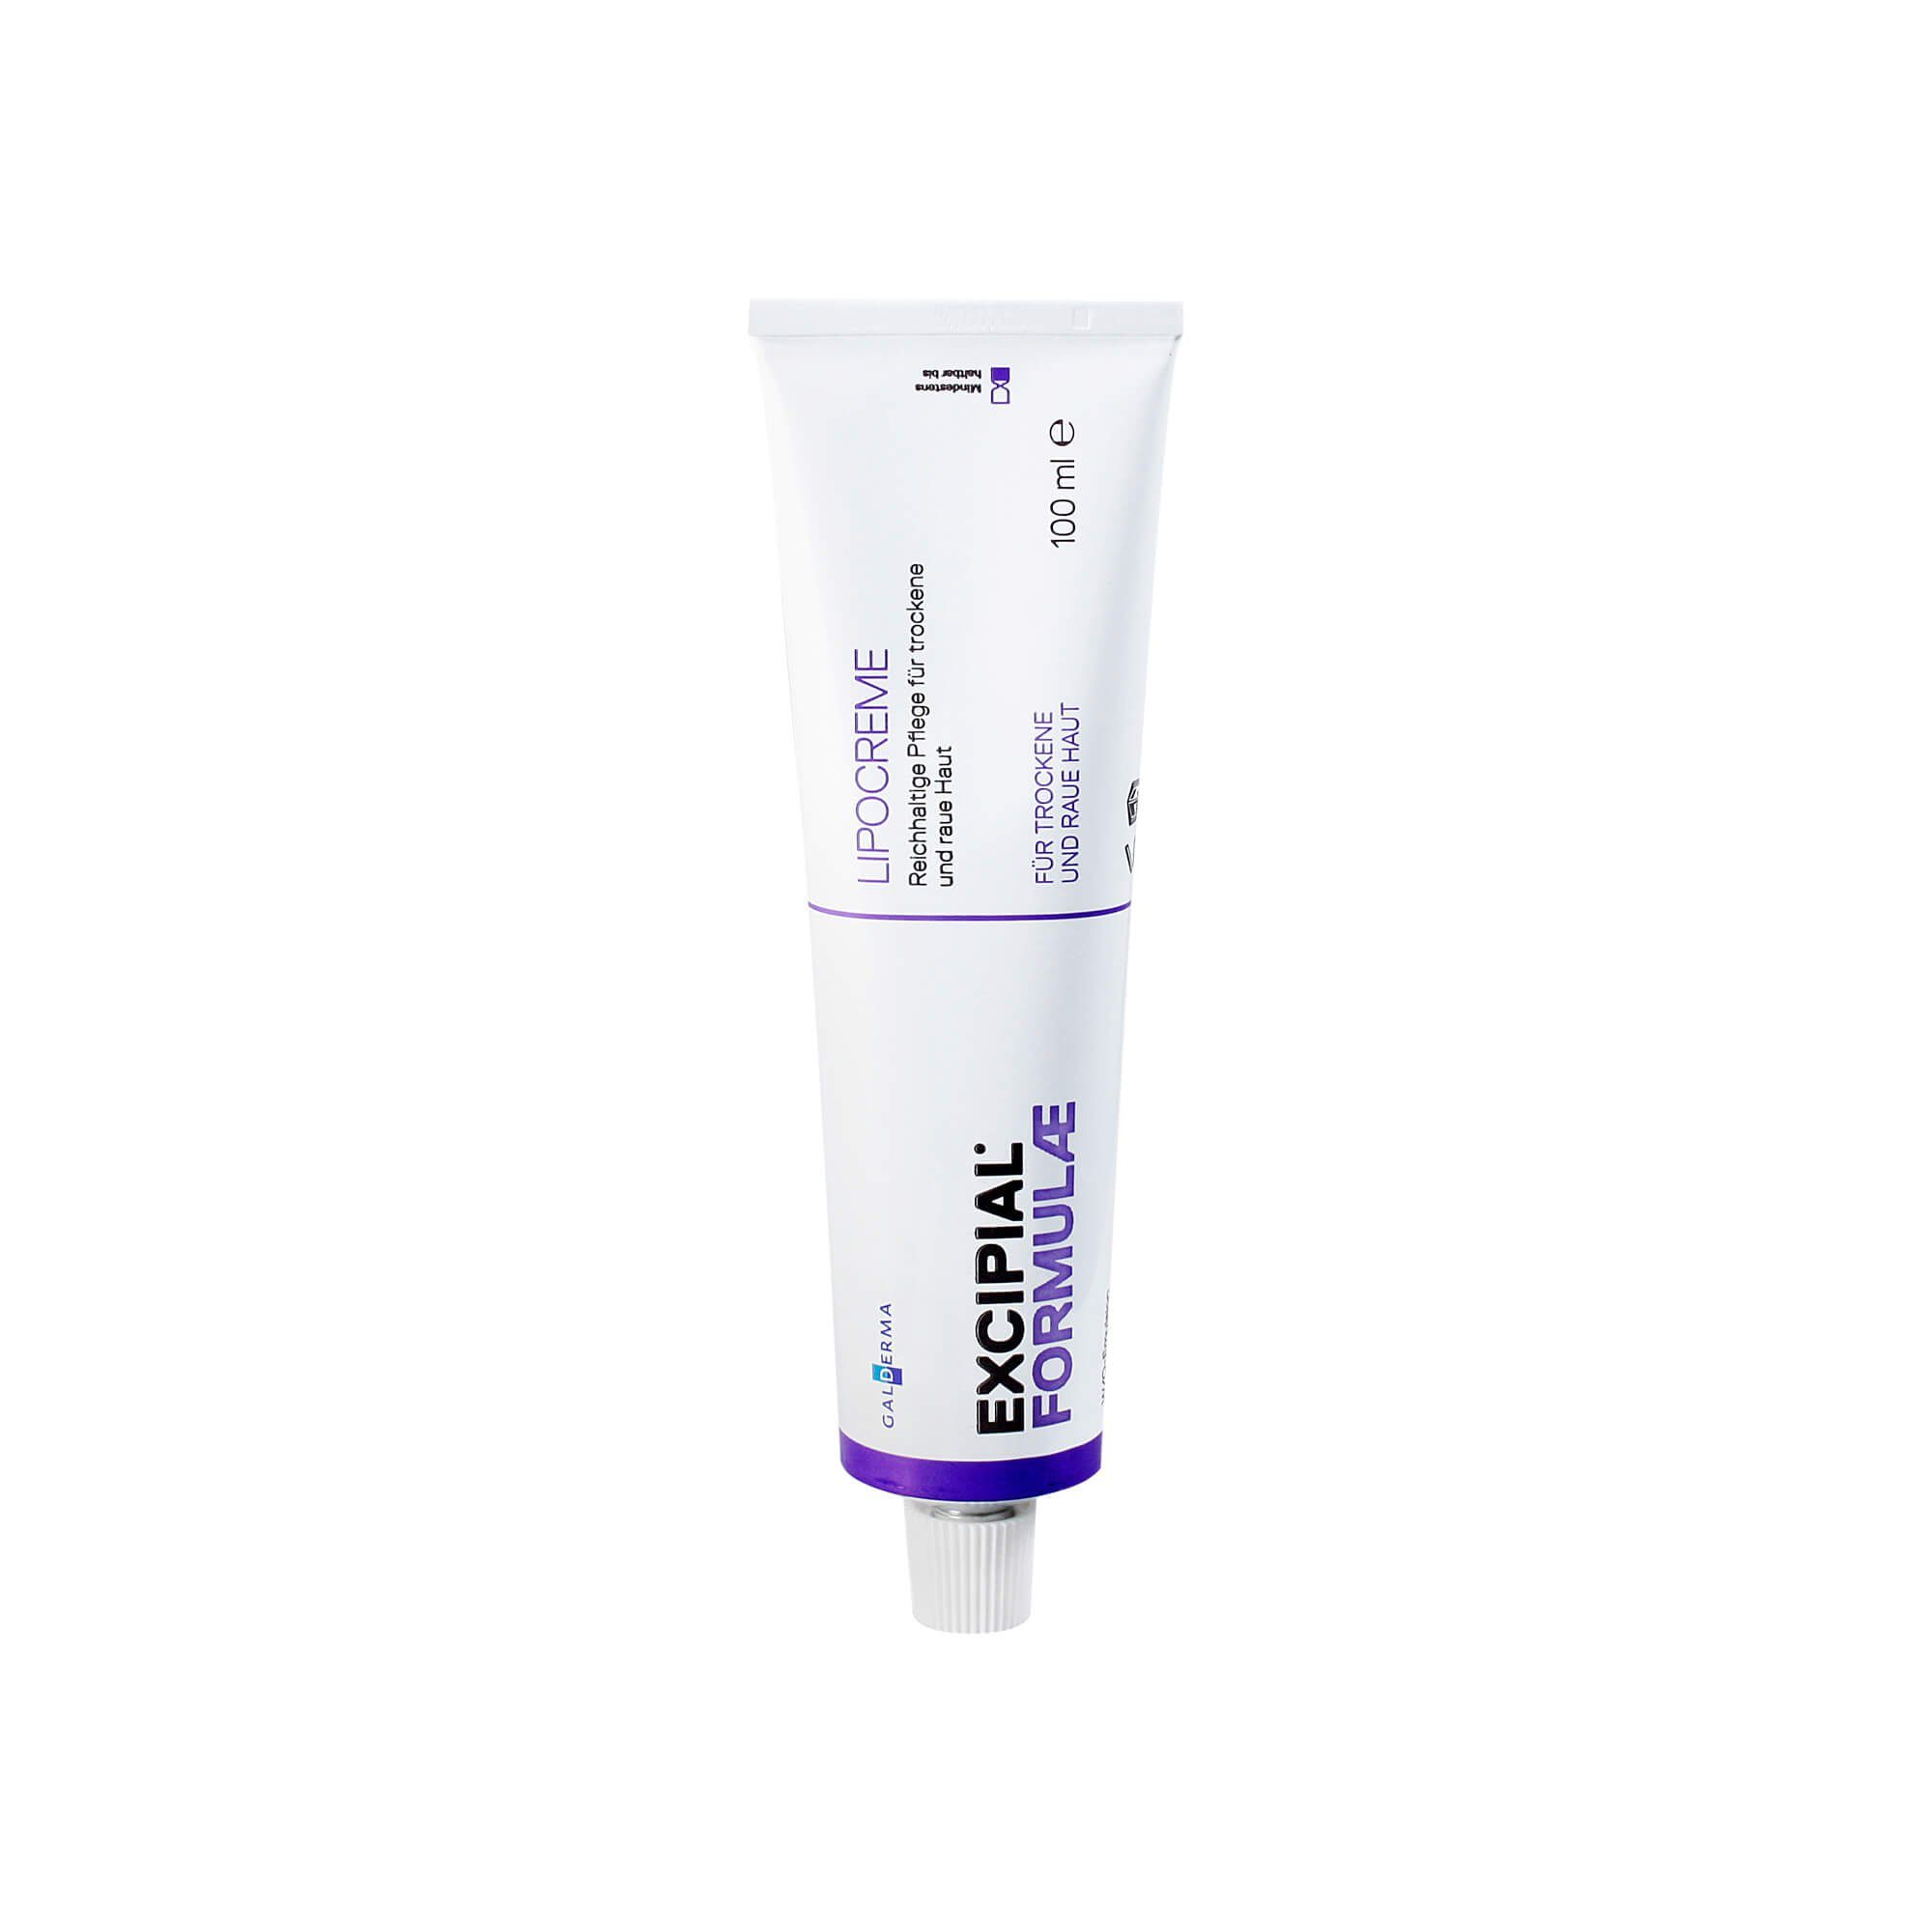 Excipial Lipocreme, 100 ml